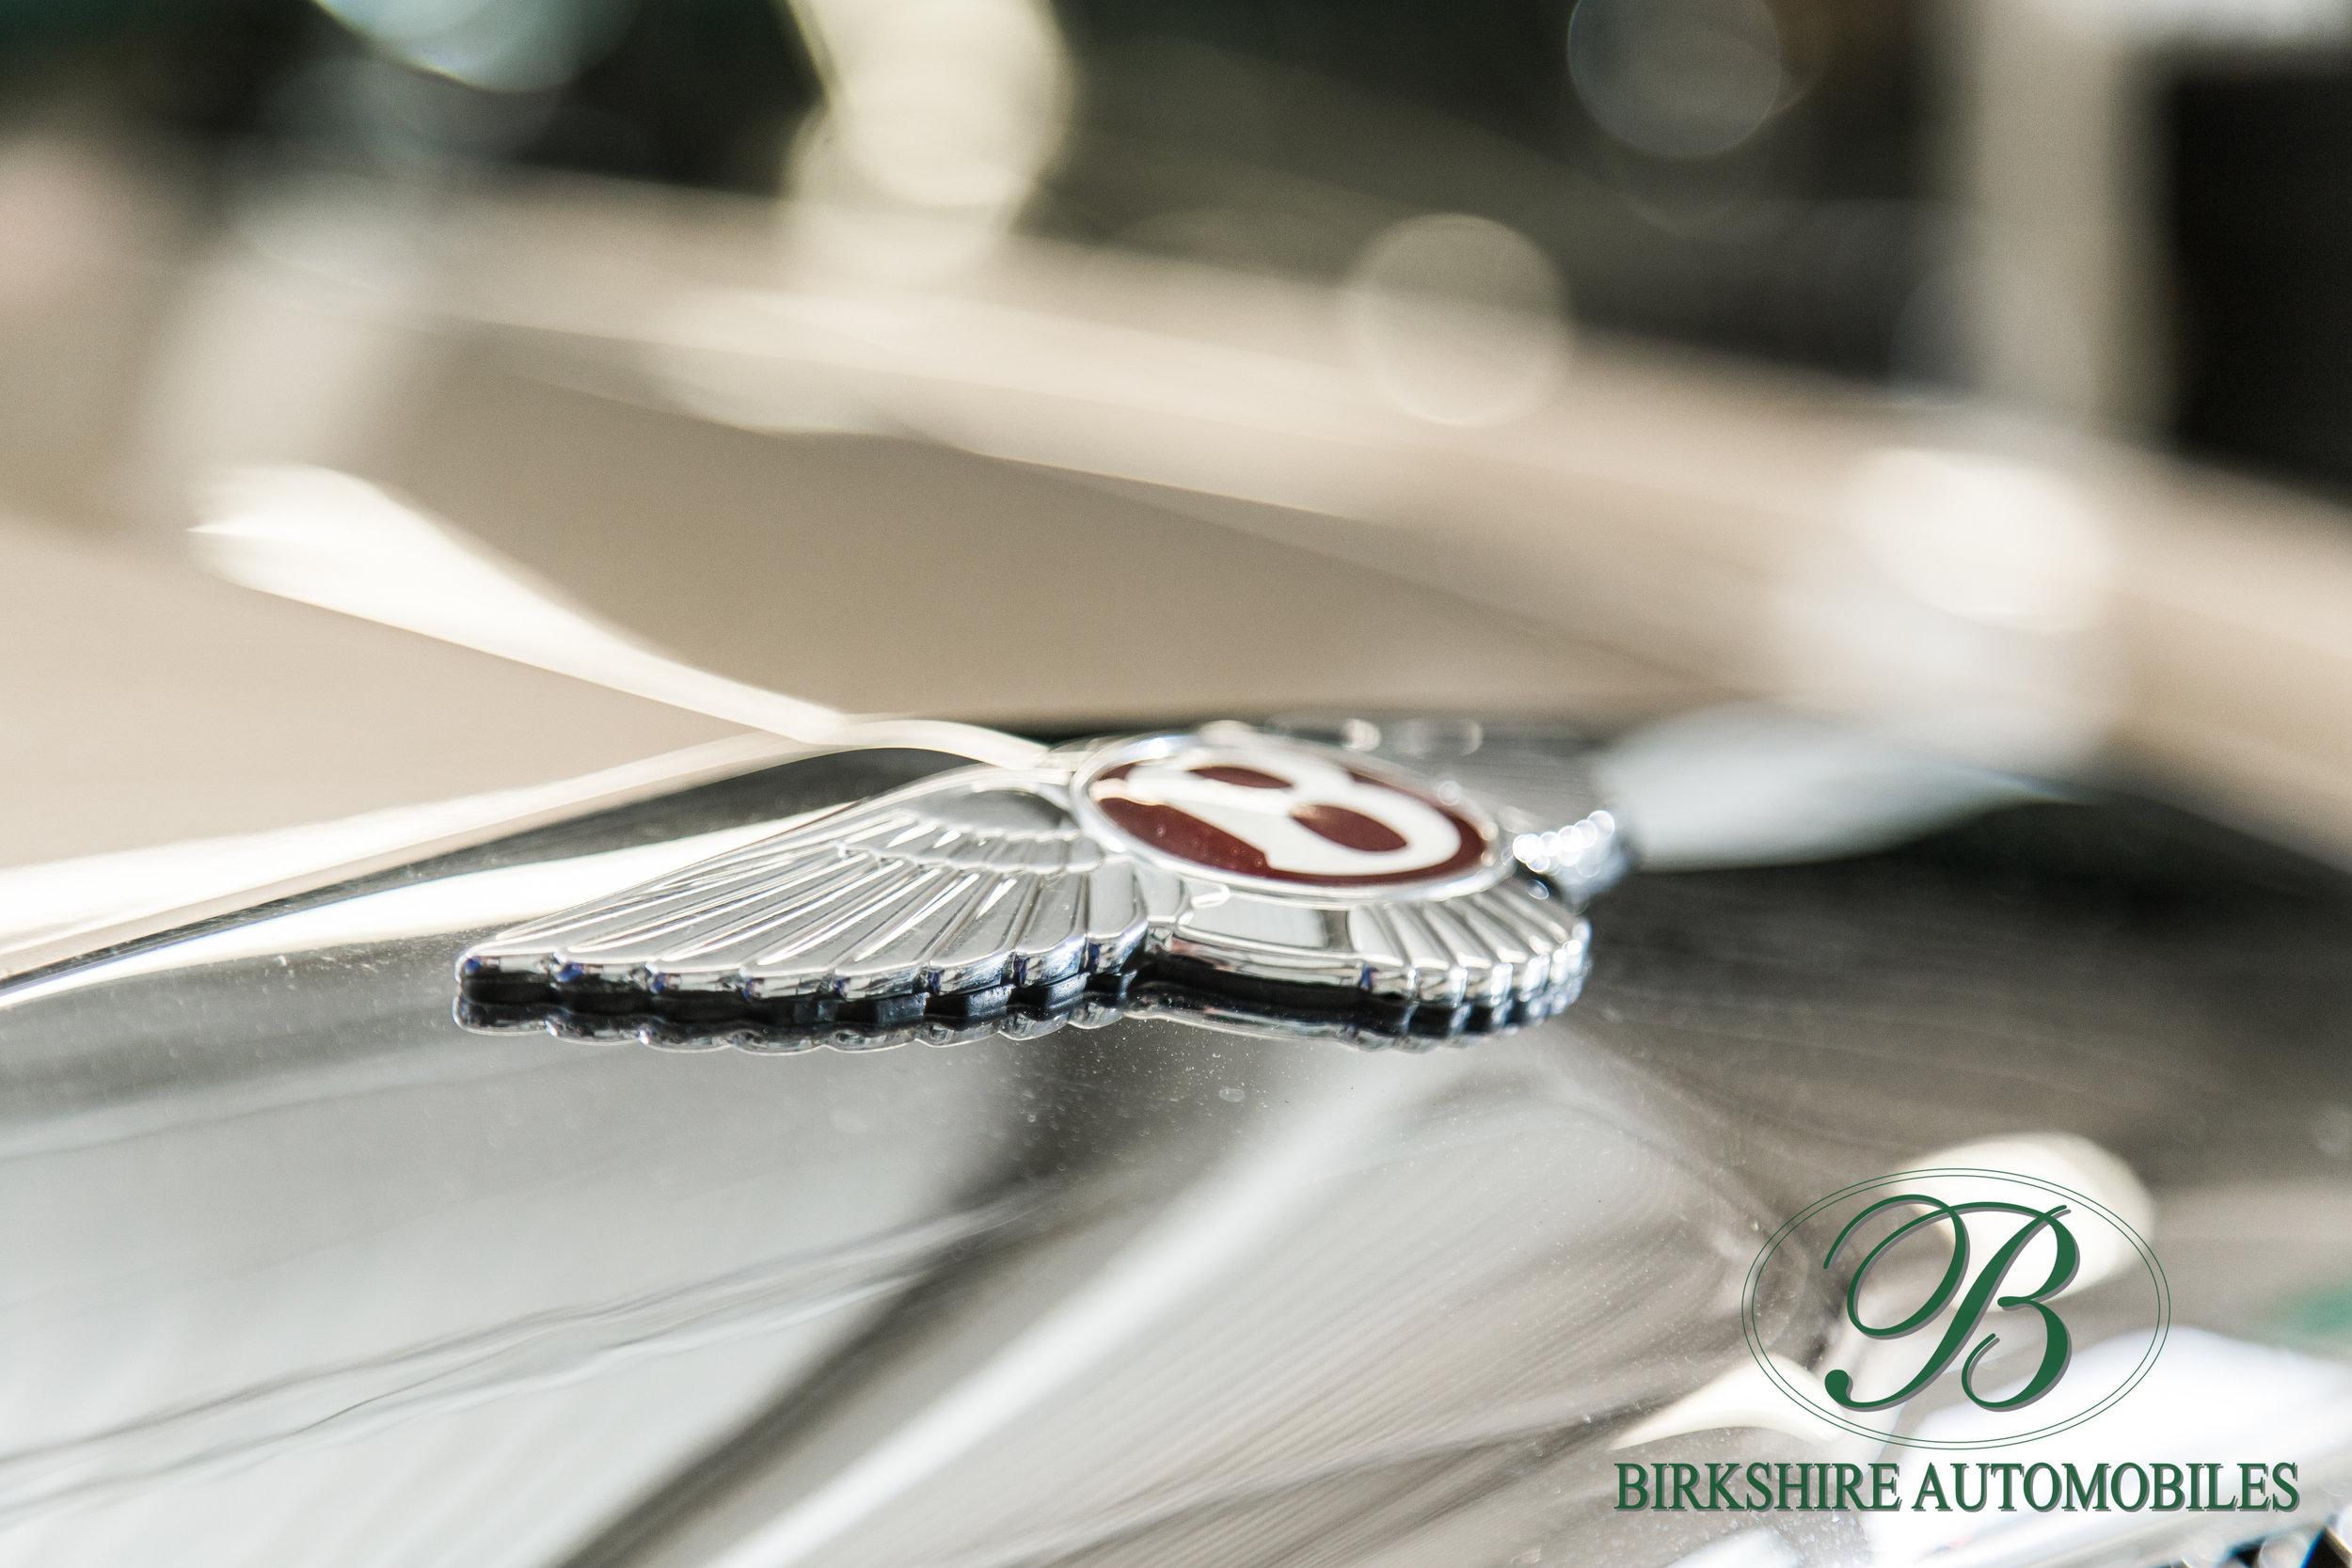 Birkshire Automobiles-334.jpg